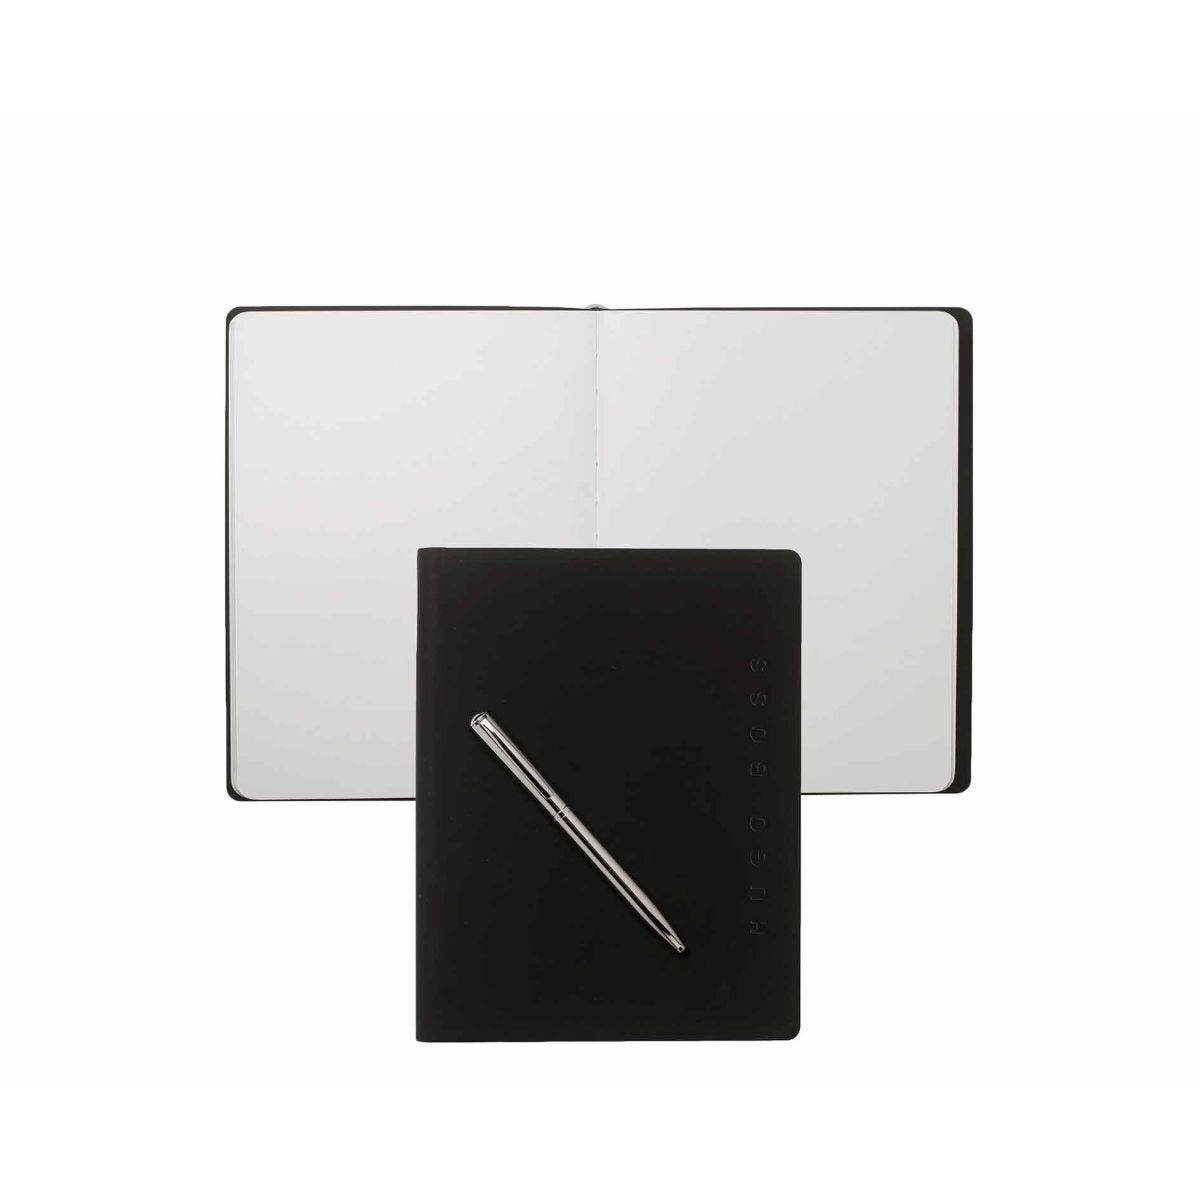 Hugo Boss Sky A5 Notebook and Pen